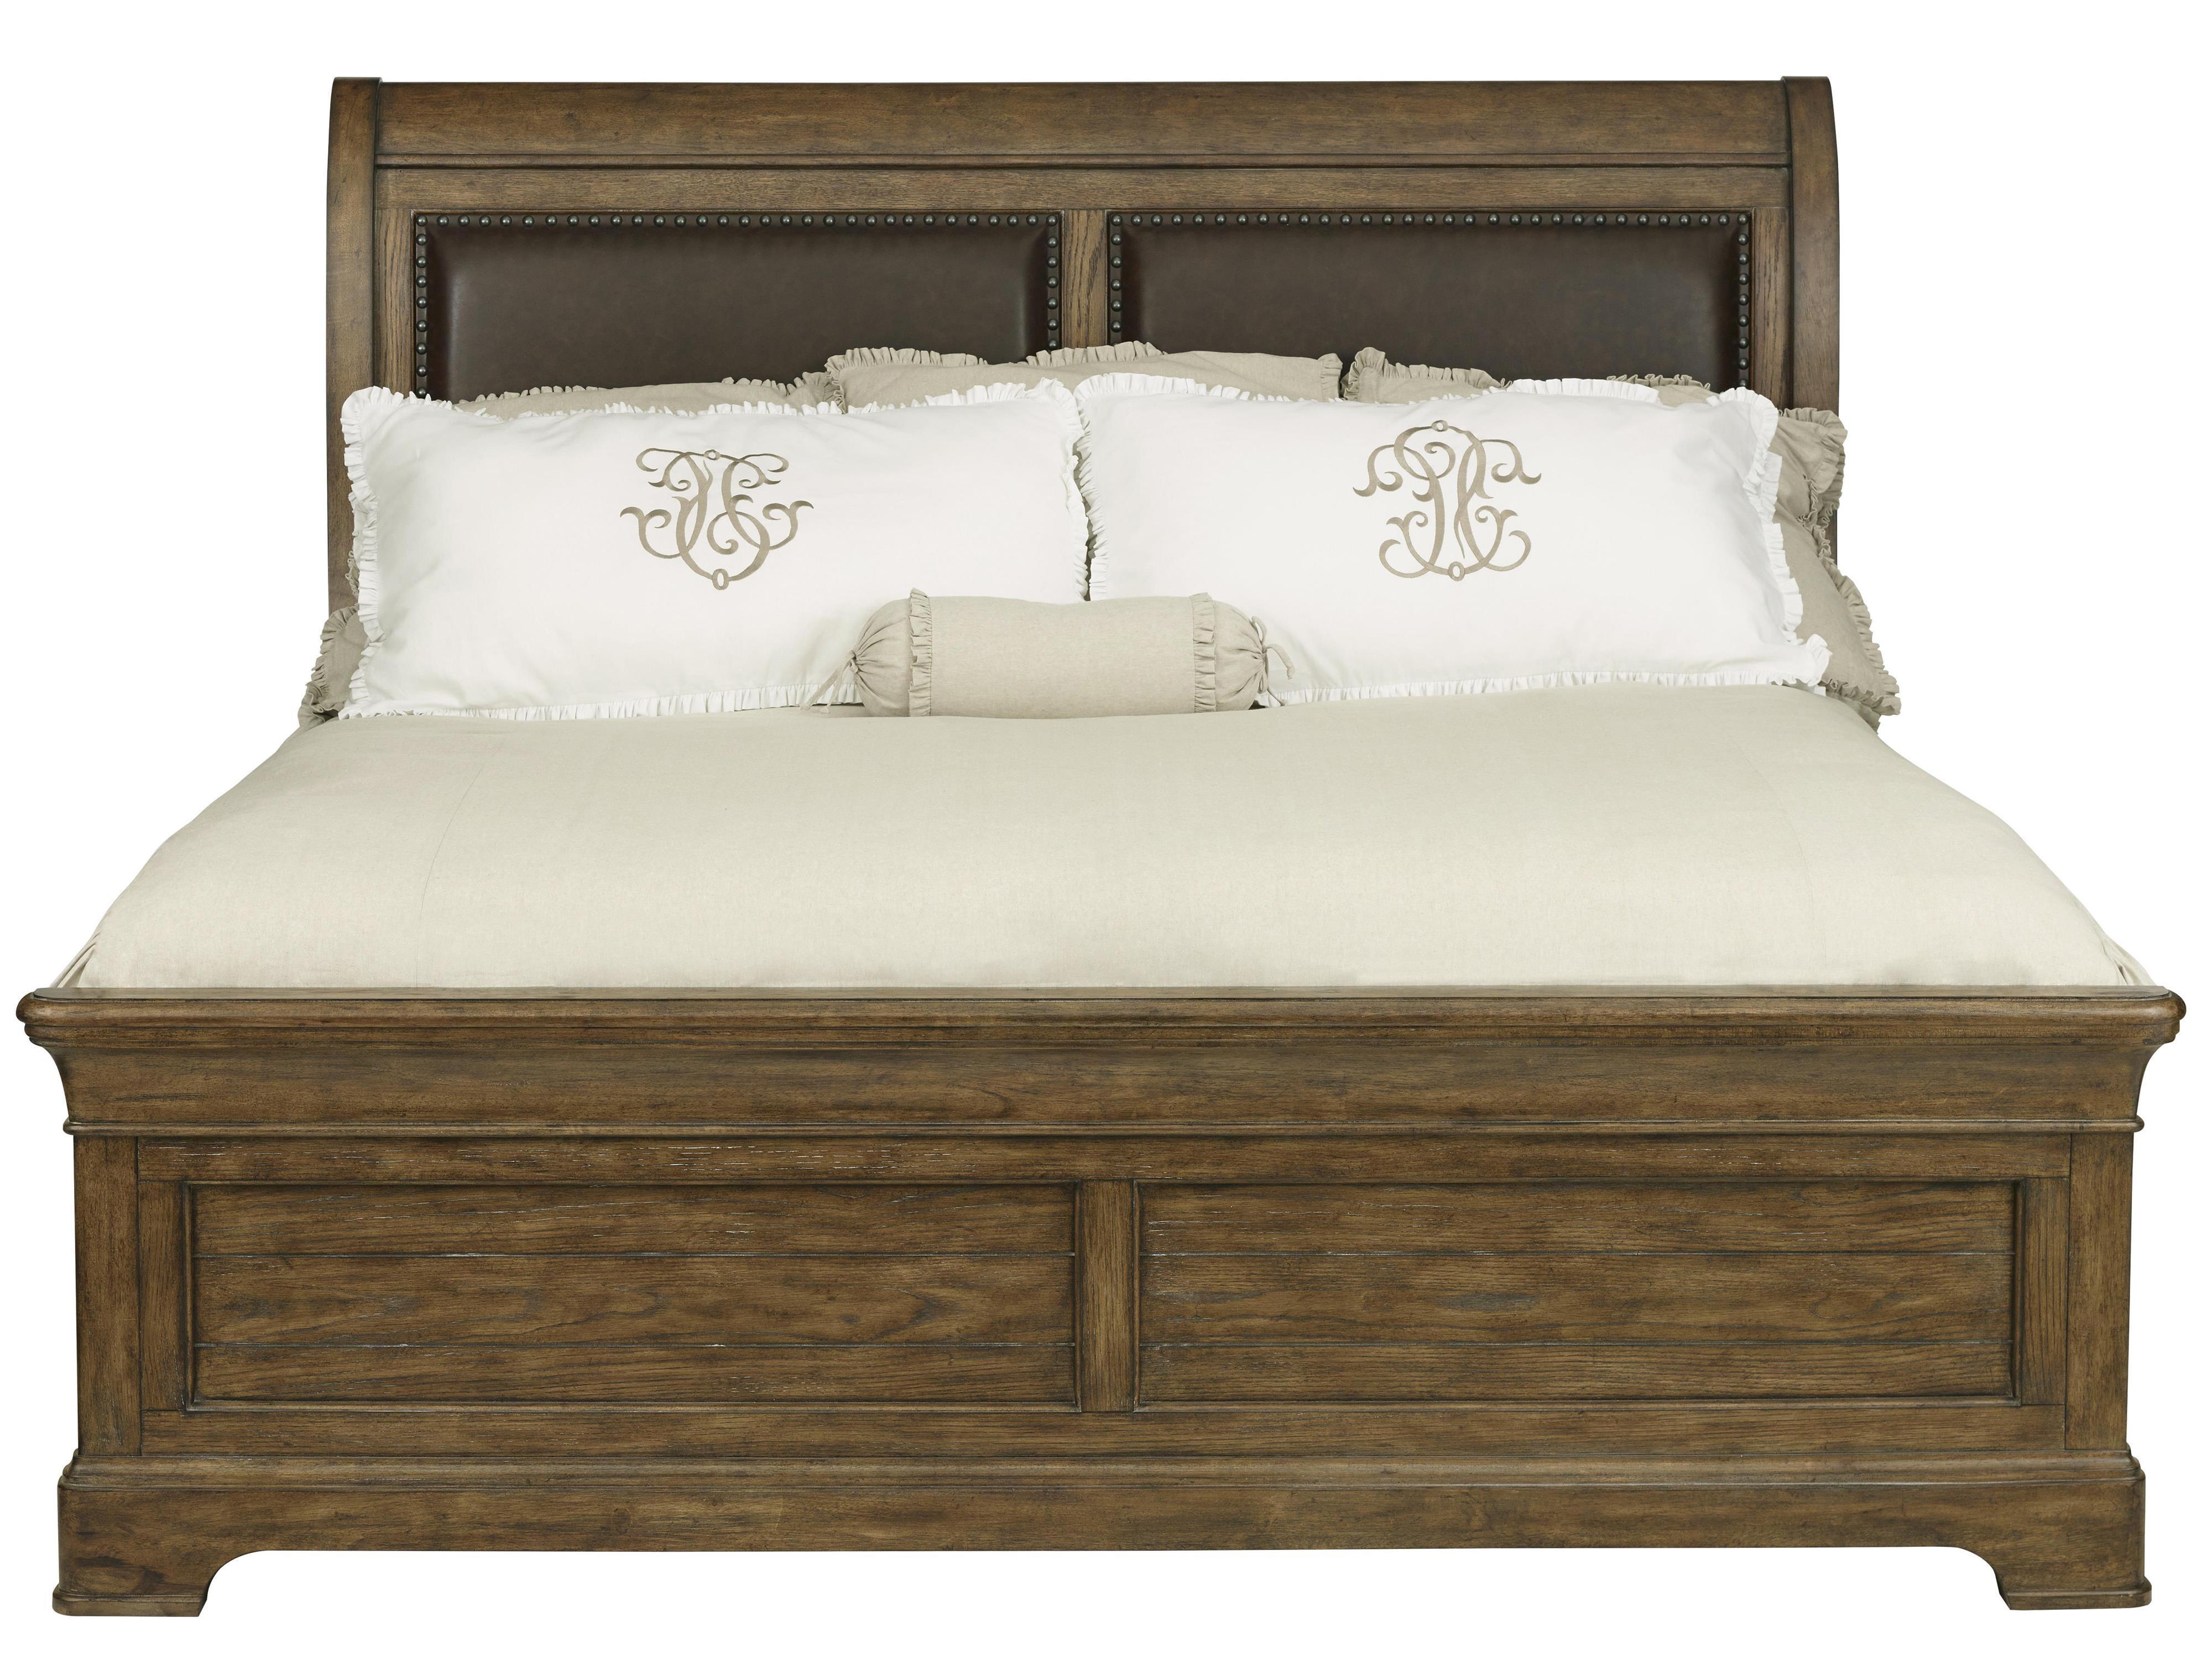 Belfort Select Virginia Mill King Sleigh Upholstered Bed - Item Number: 8854-274+271+400